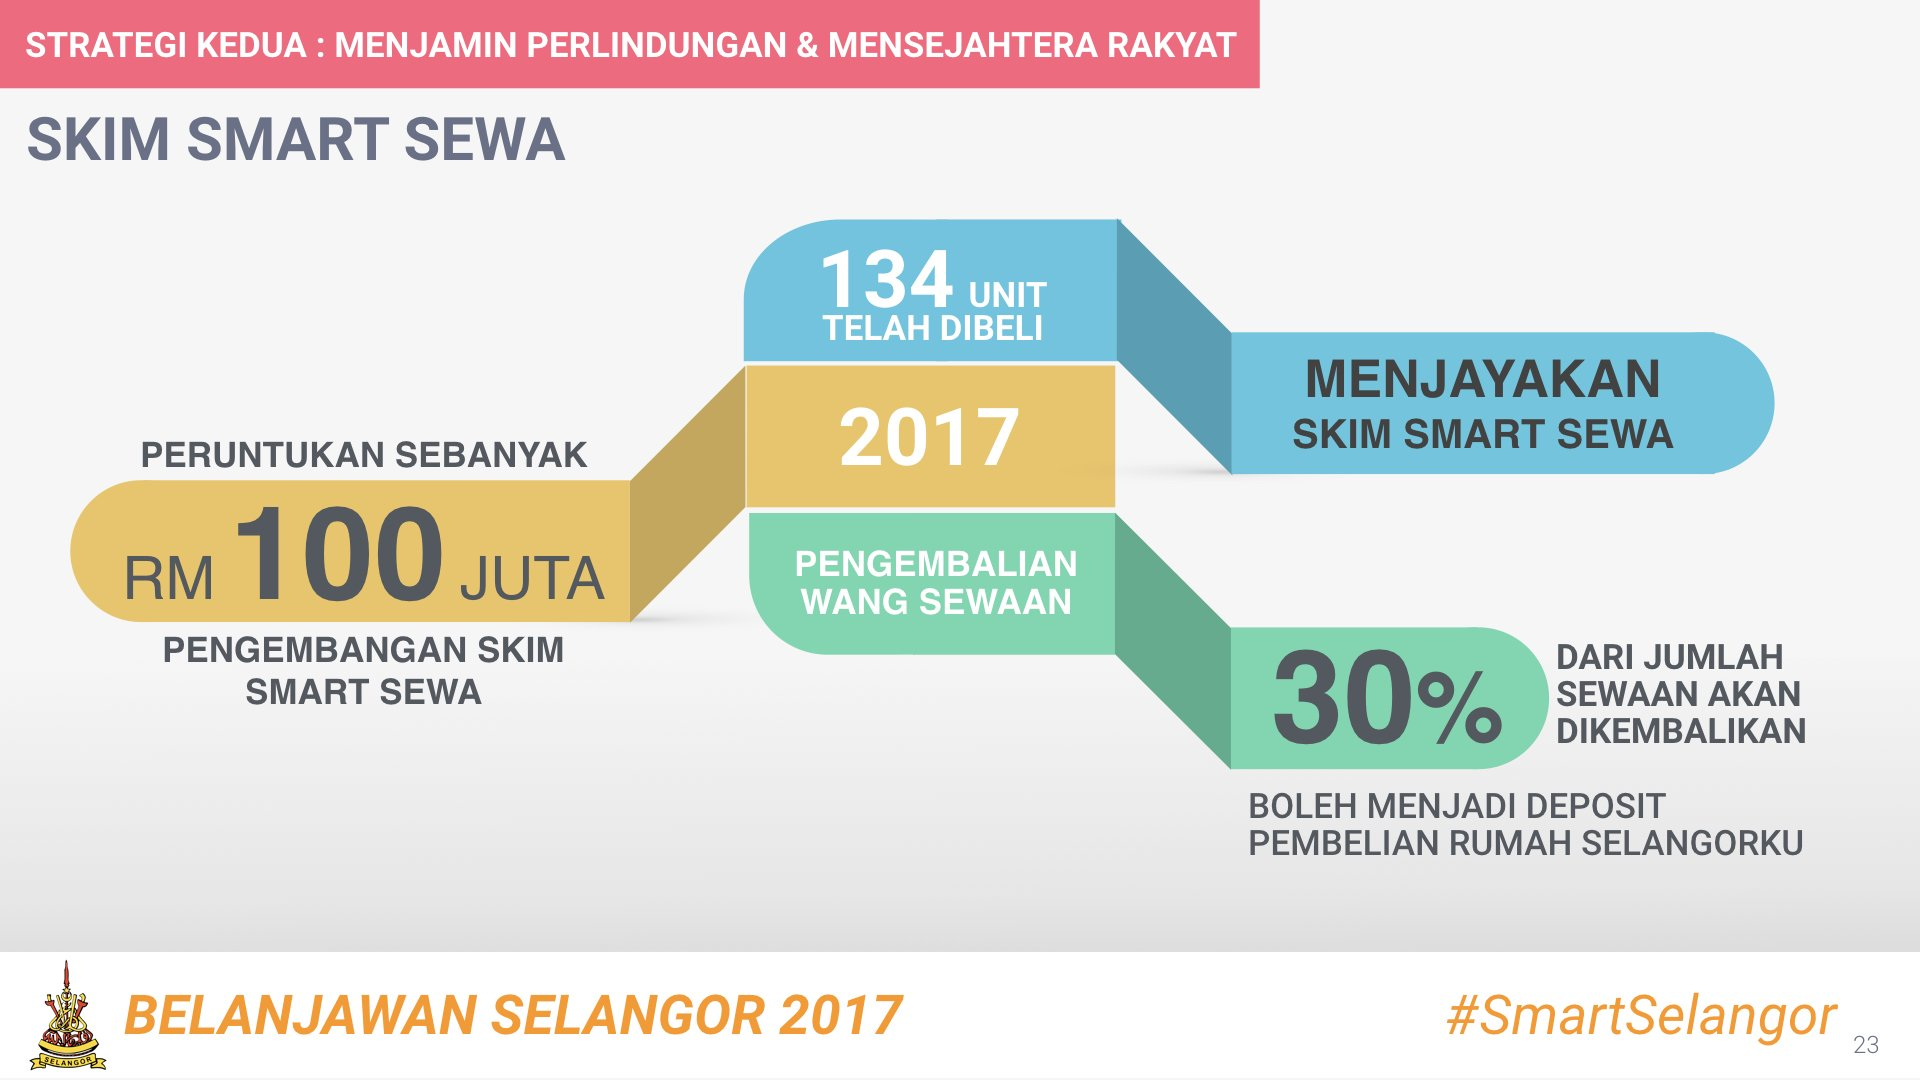 Mohamed Azmin Ali Di Twitter Skim Smart Sewa Bagi Membantu Golongan Berpendapatan Sederhana Menyewa Dan Akhirnya Berupaya Untuk Memiliki Kediaman Selangor17 Https T Co 1sd3es2wyi